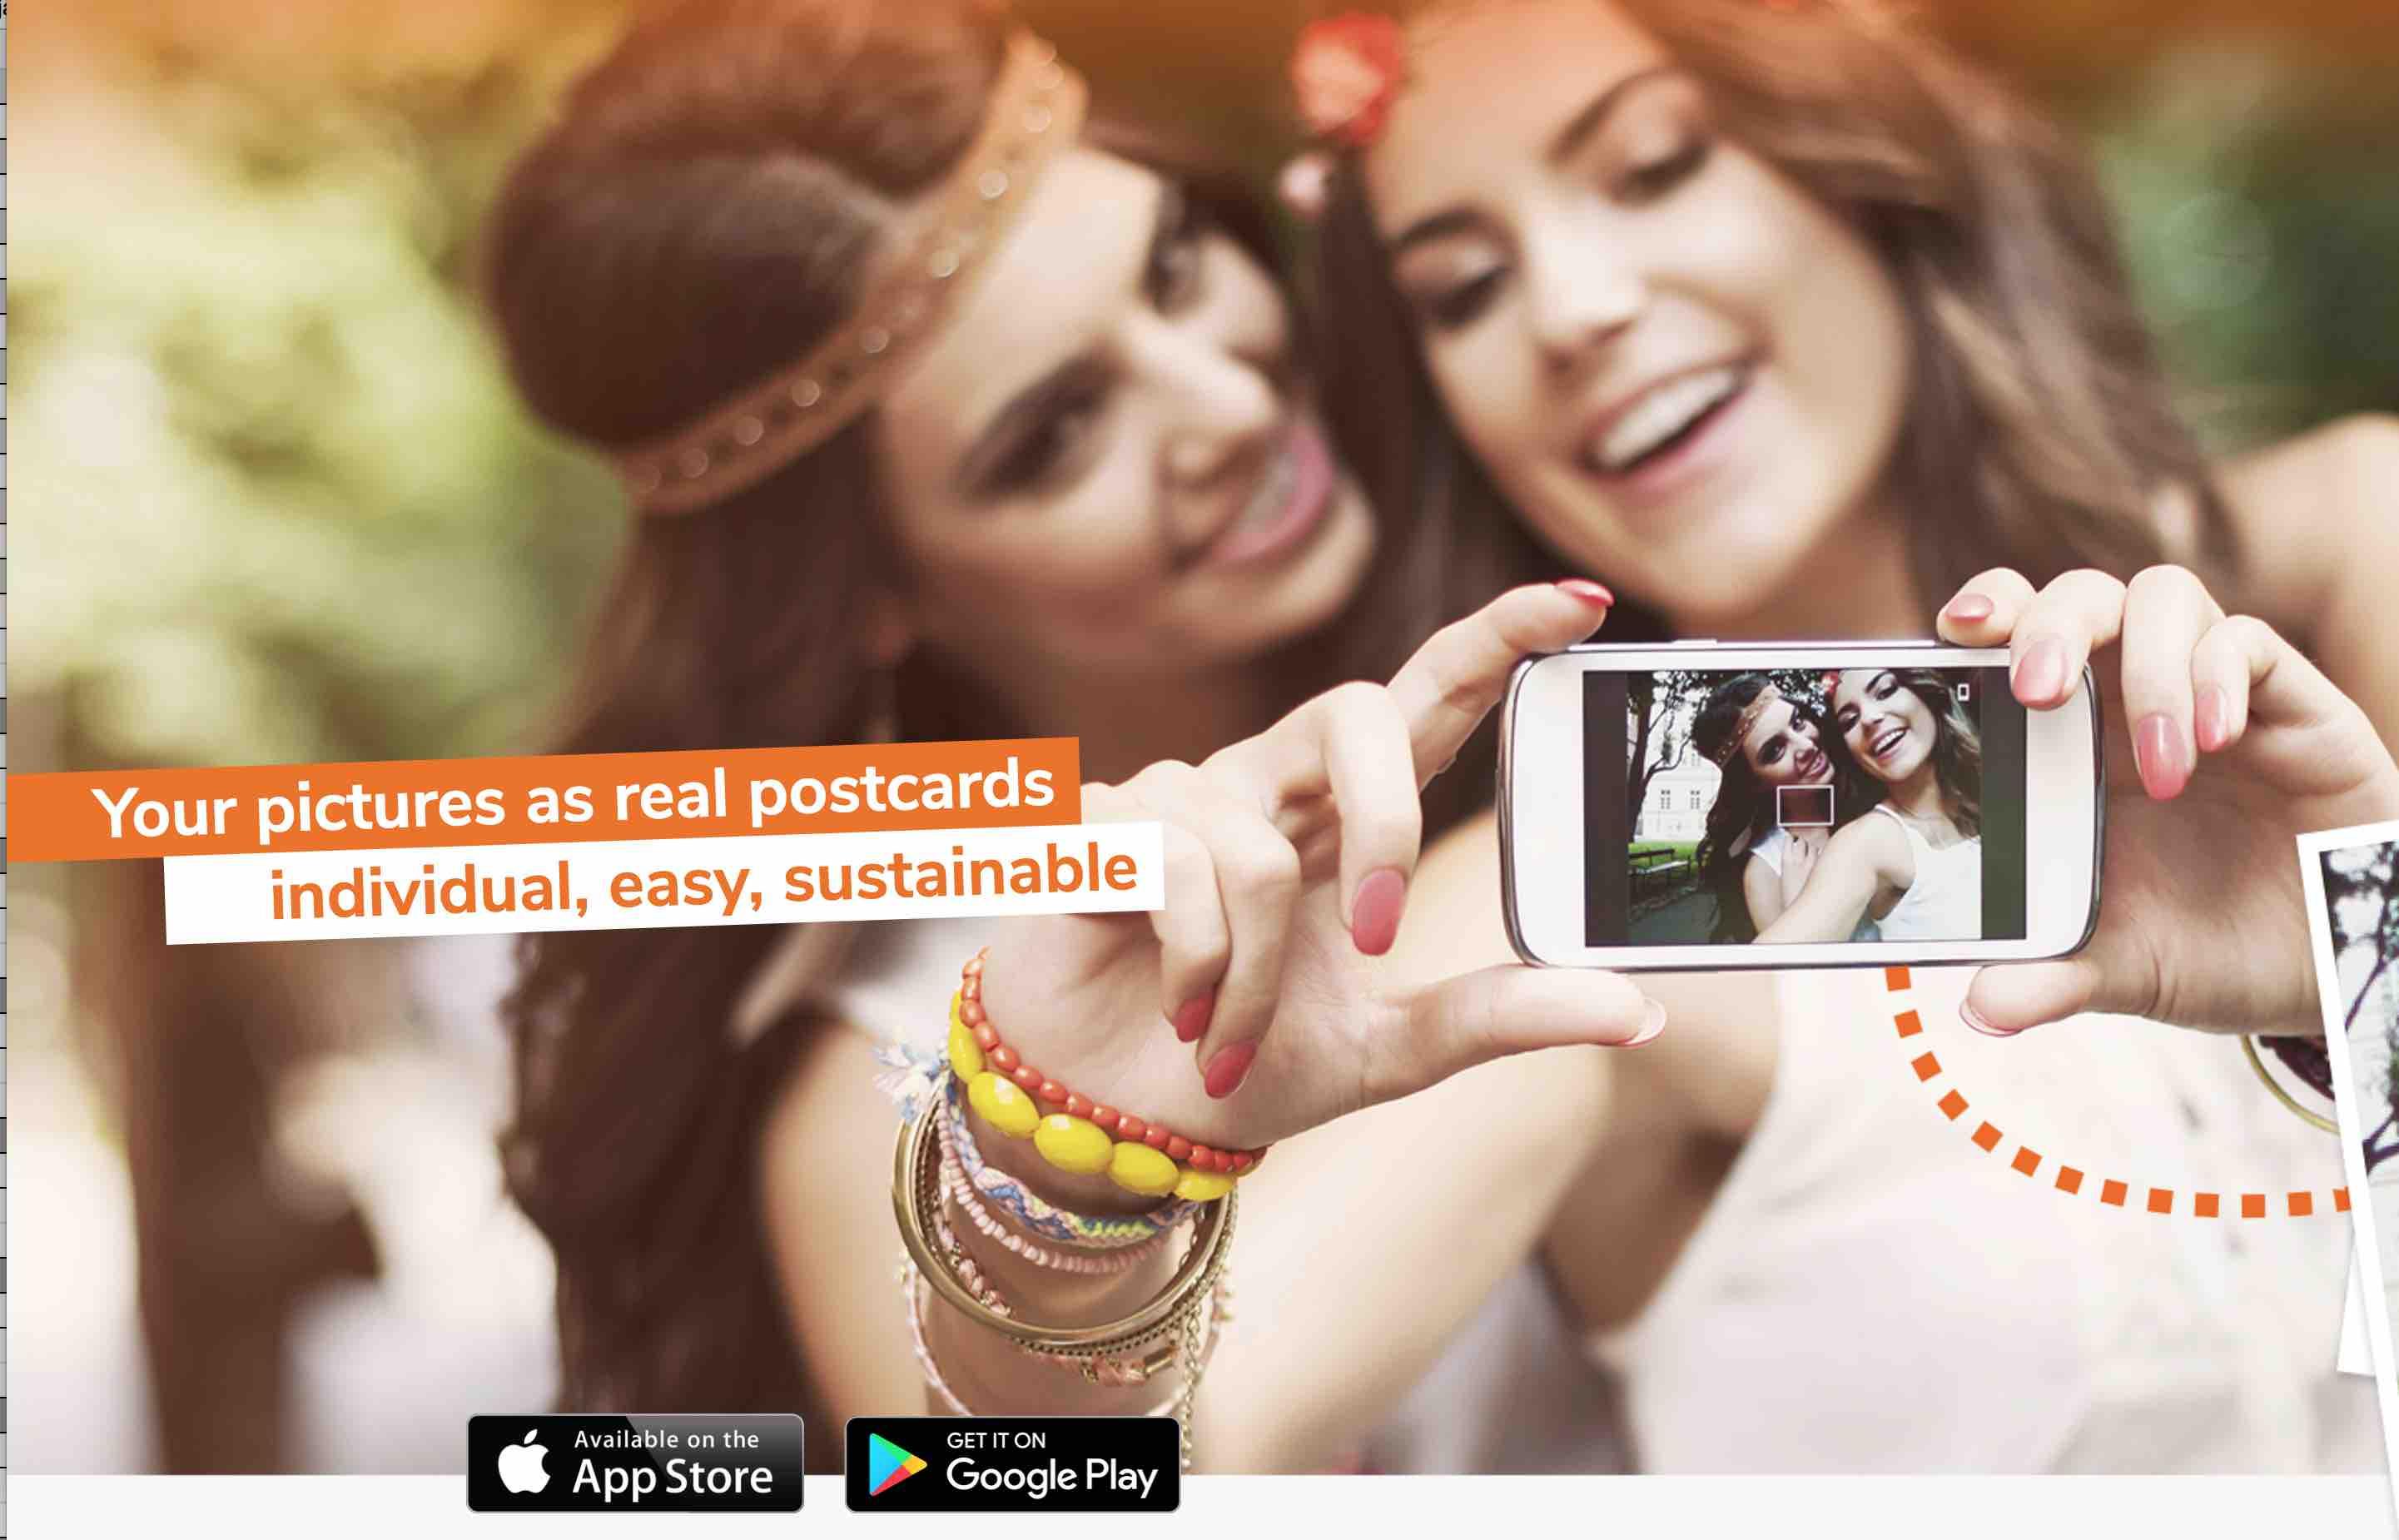 [Android & IOS] GRATIS statt 1,99€ - Postkarte weltweit versenden Postando App